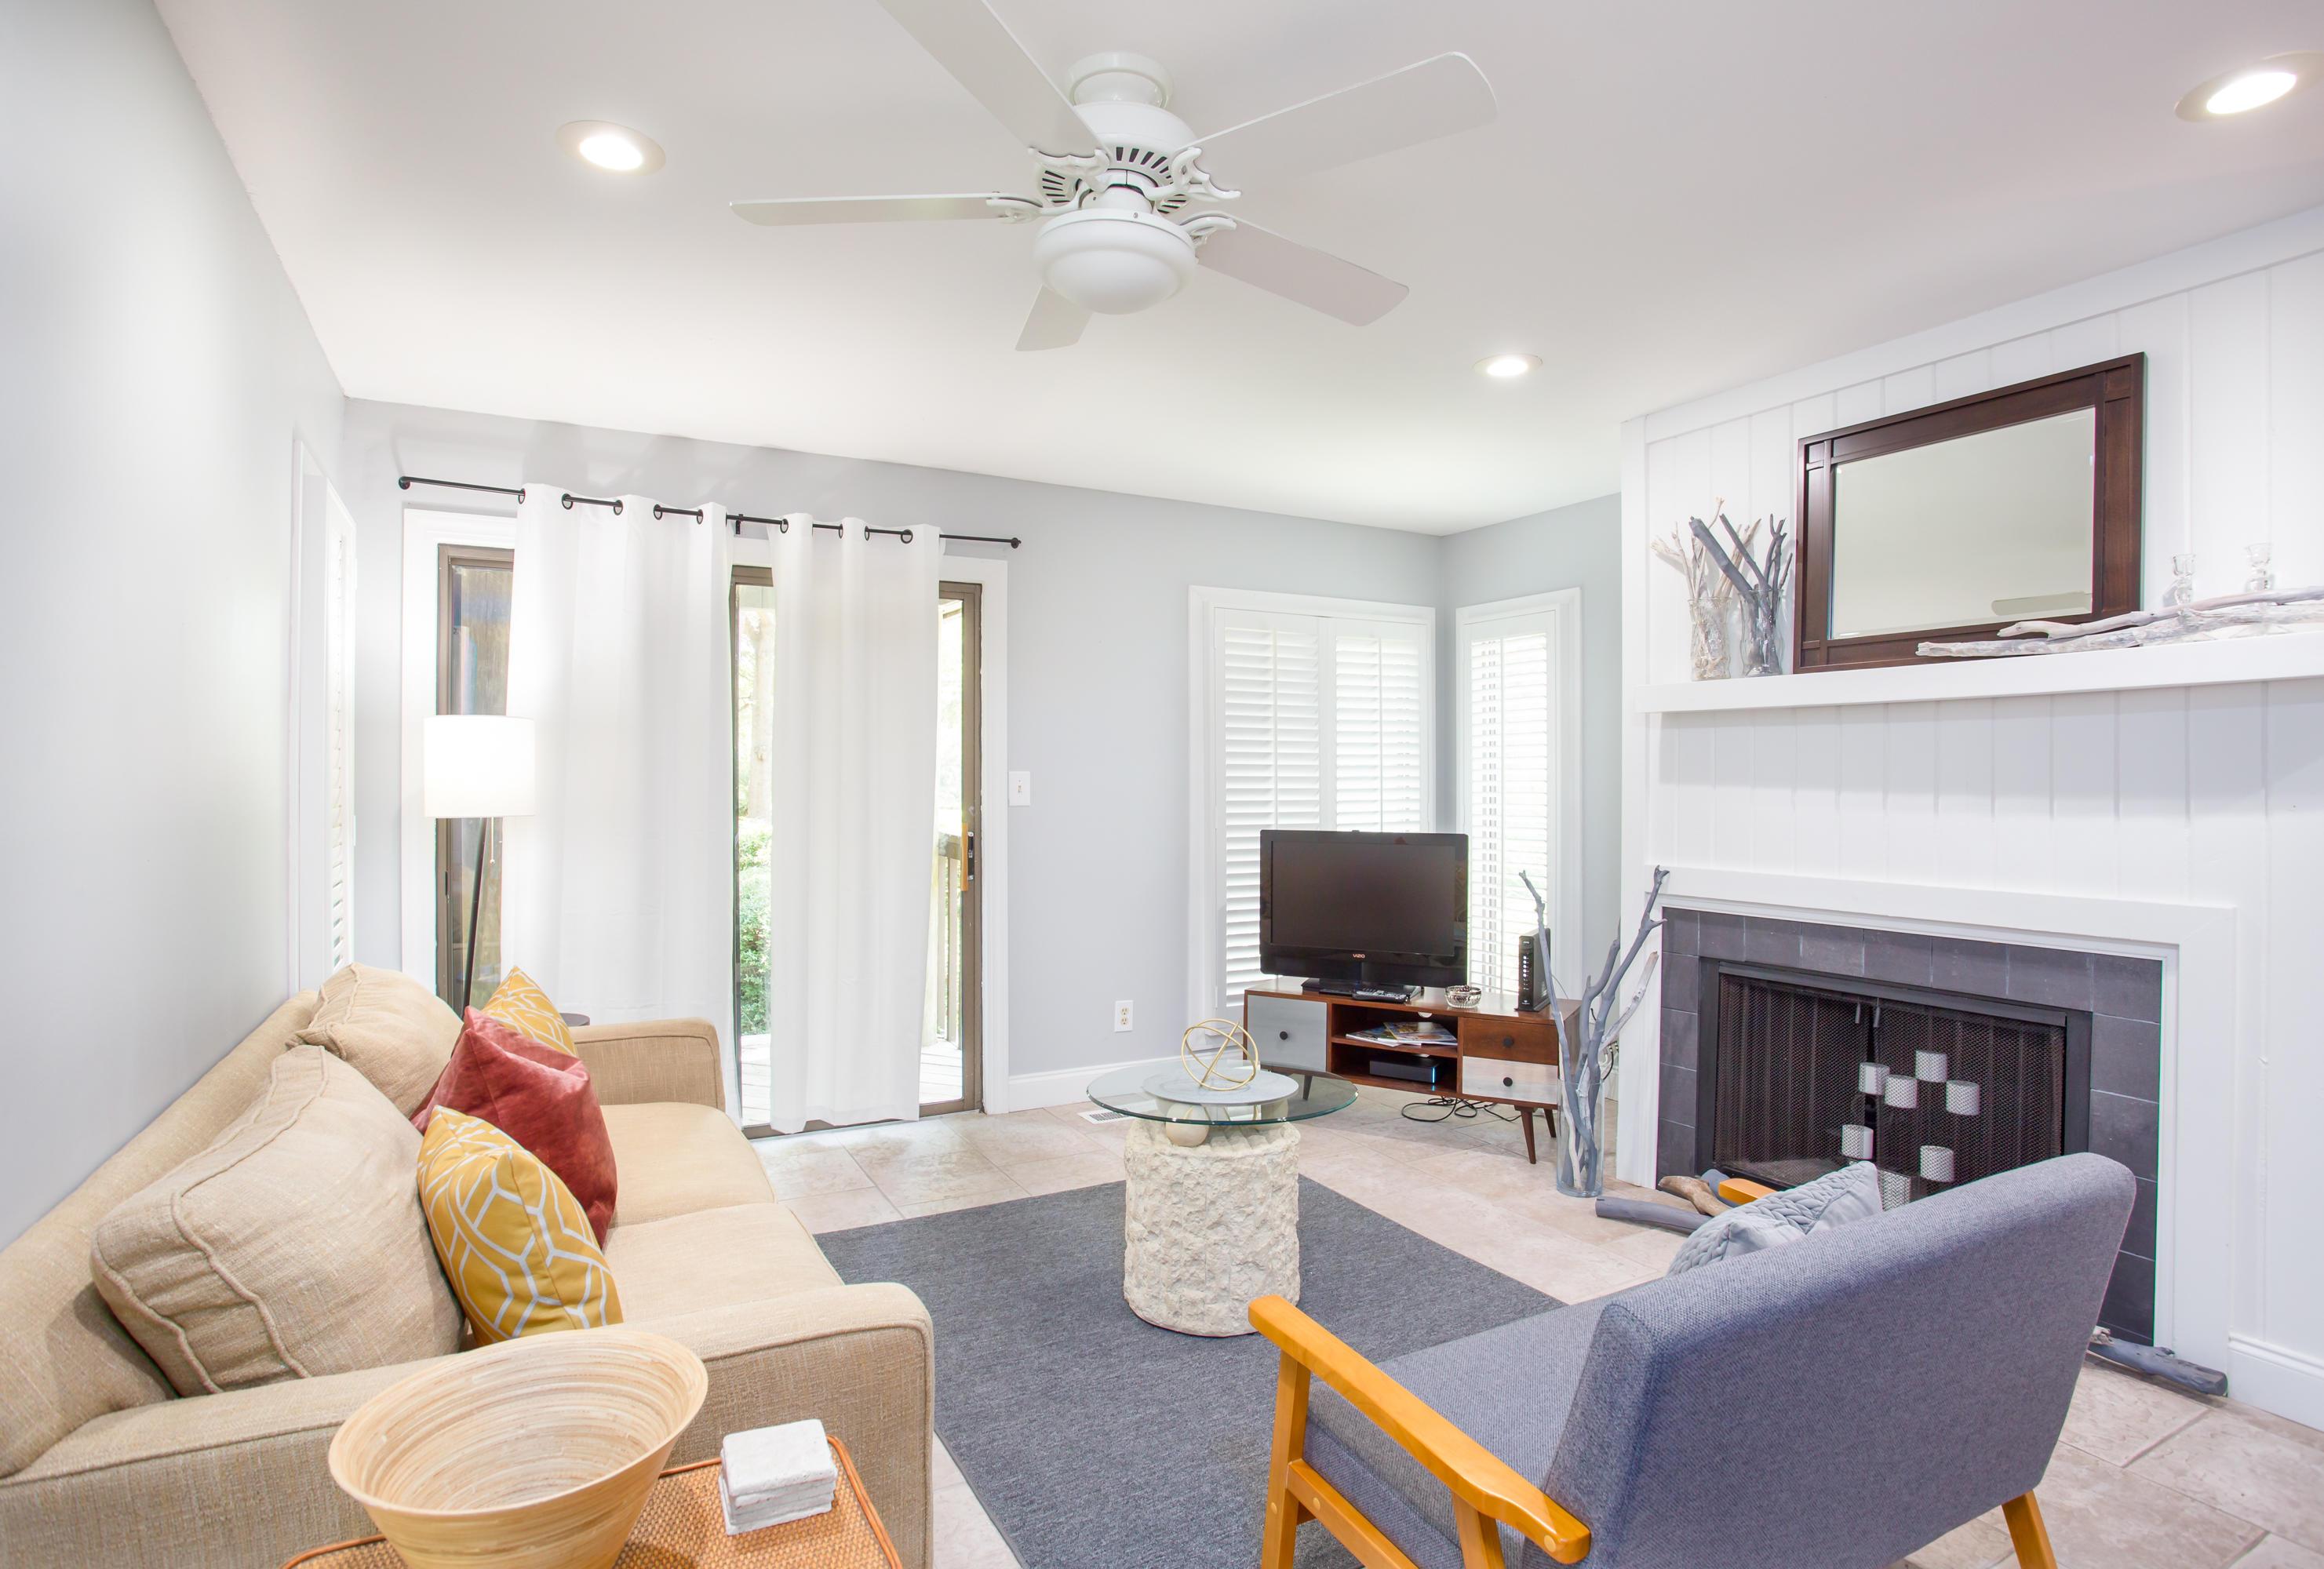 Kiawah Island Homes For Sale - 4523 Park Lake, Kiawah Island, SC - 17